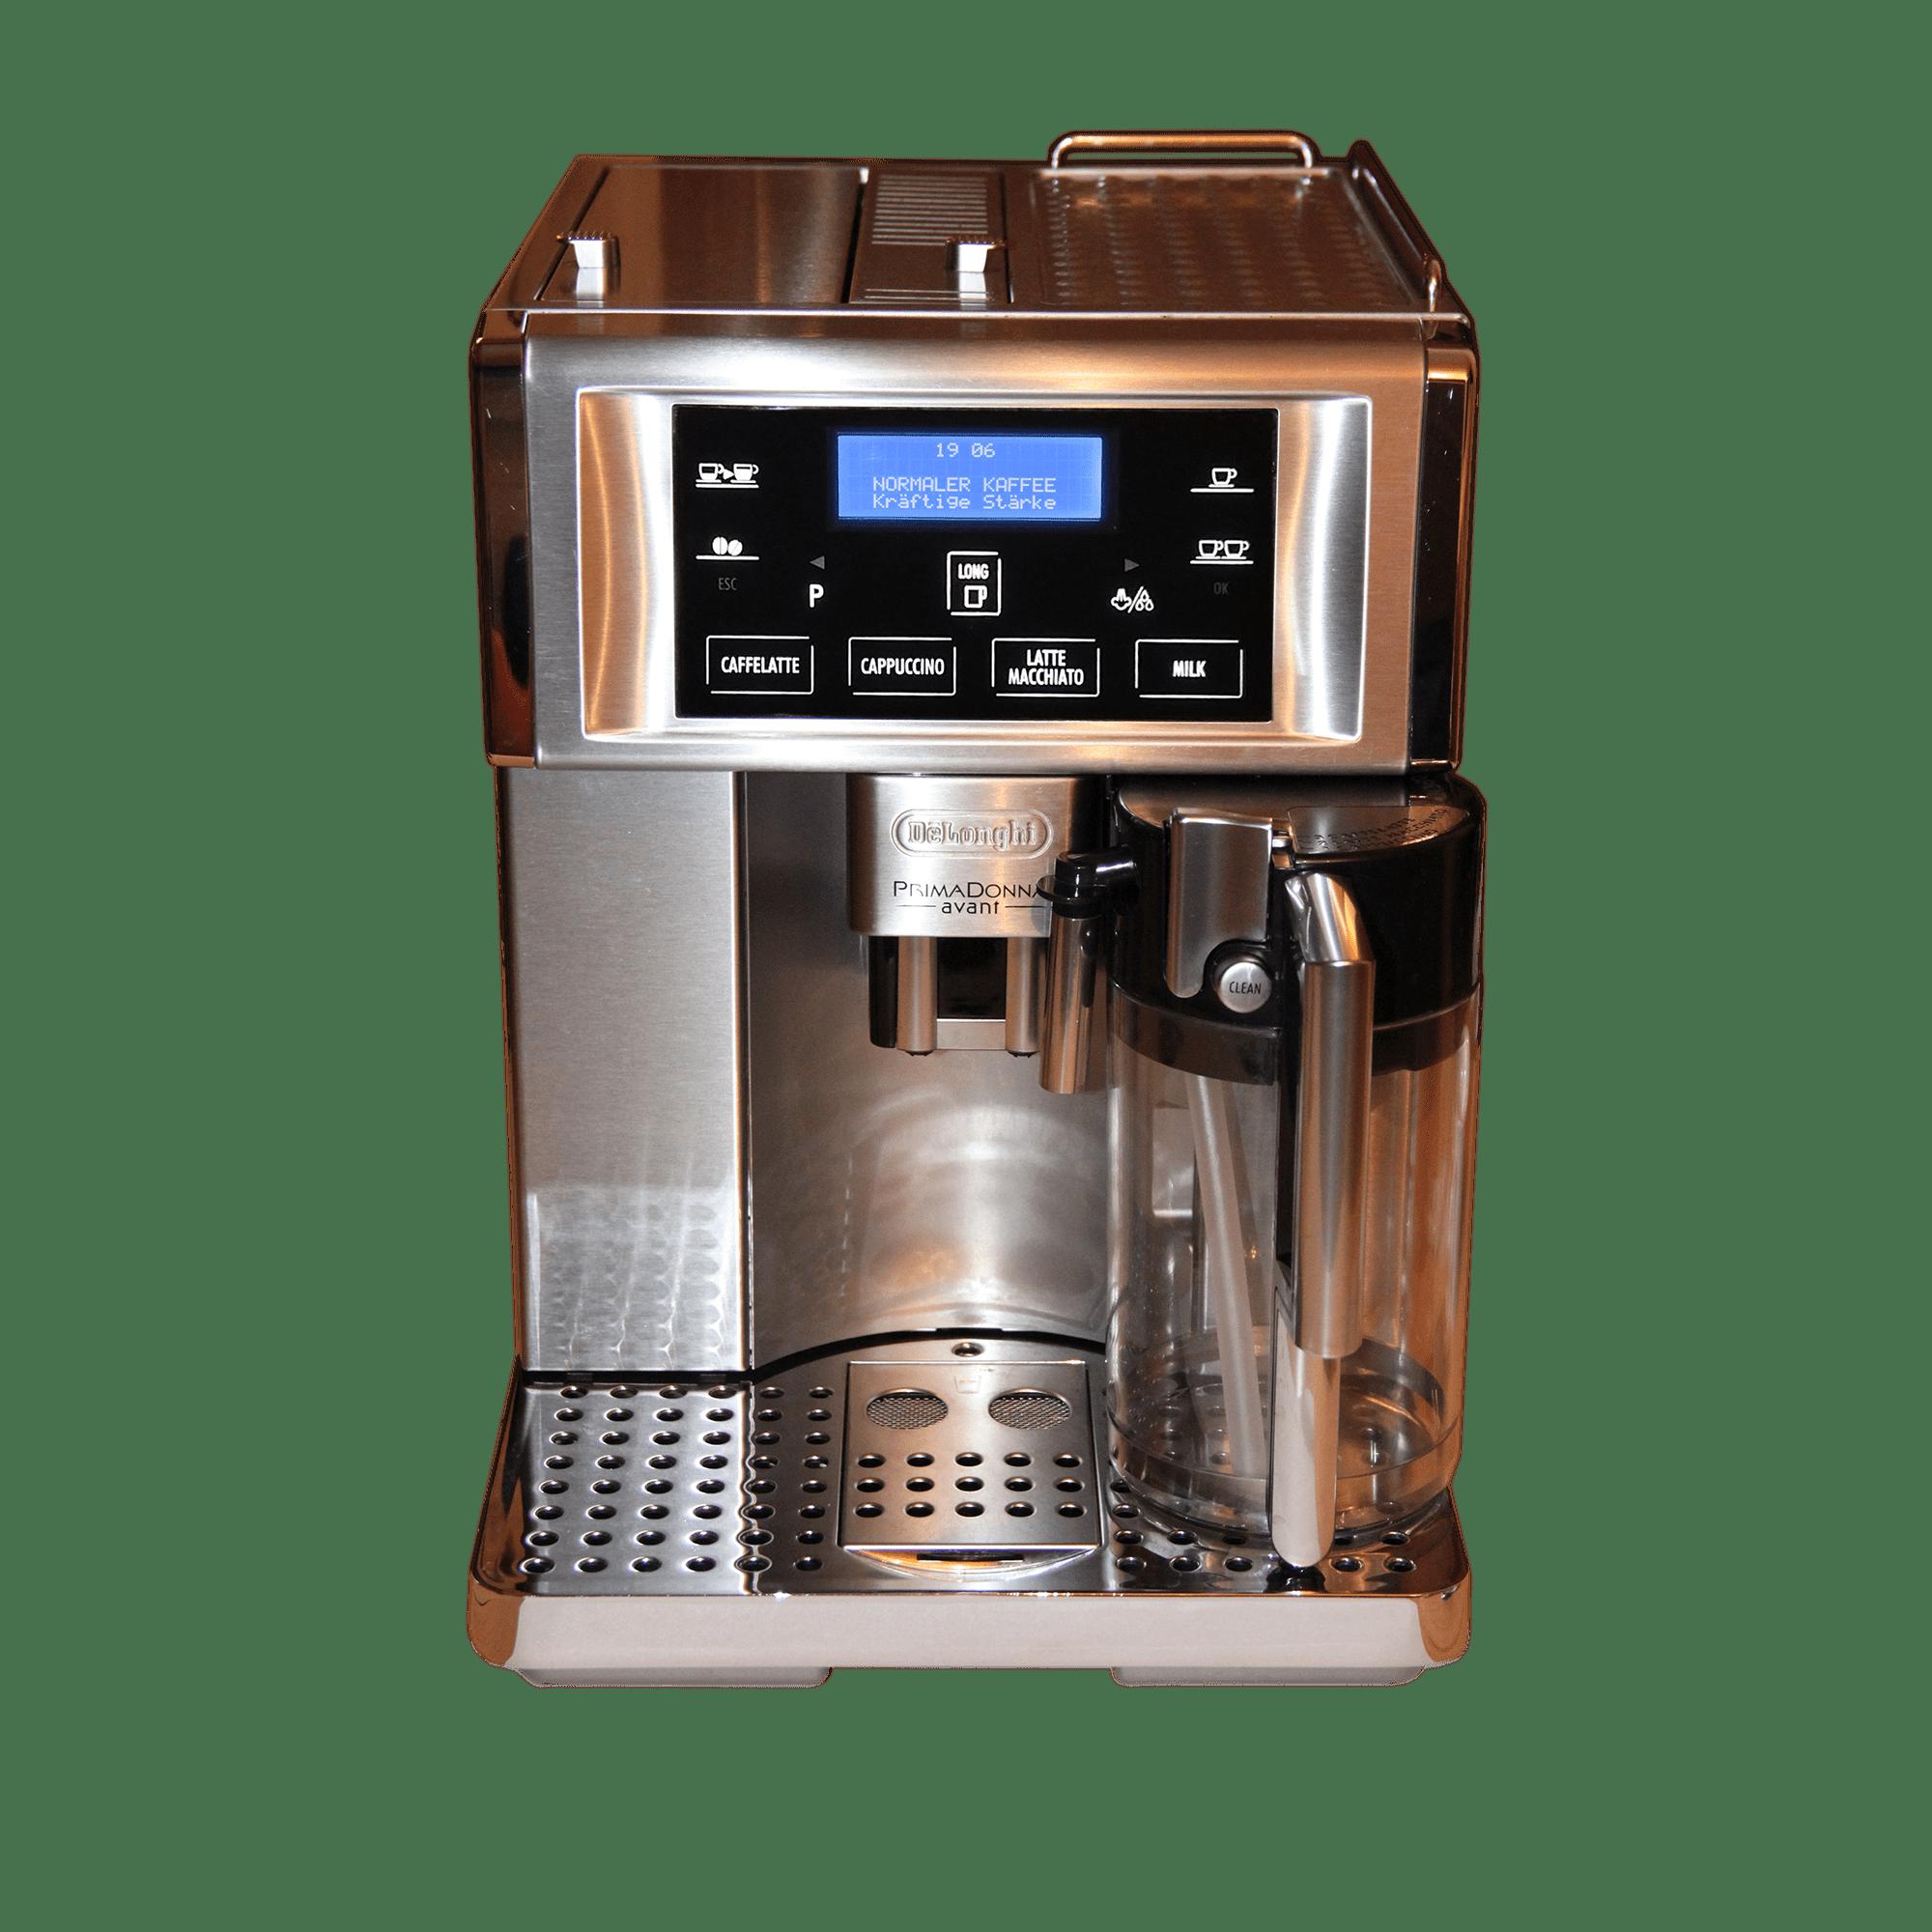 Delonghi_Primadonna_Avant_ESAM_6750_Kaffeevollautomat-min